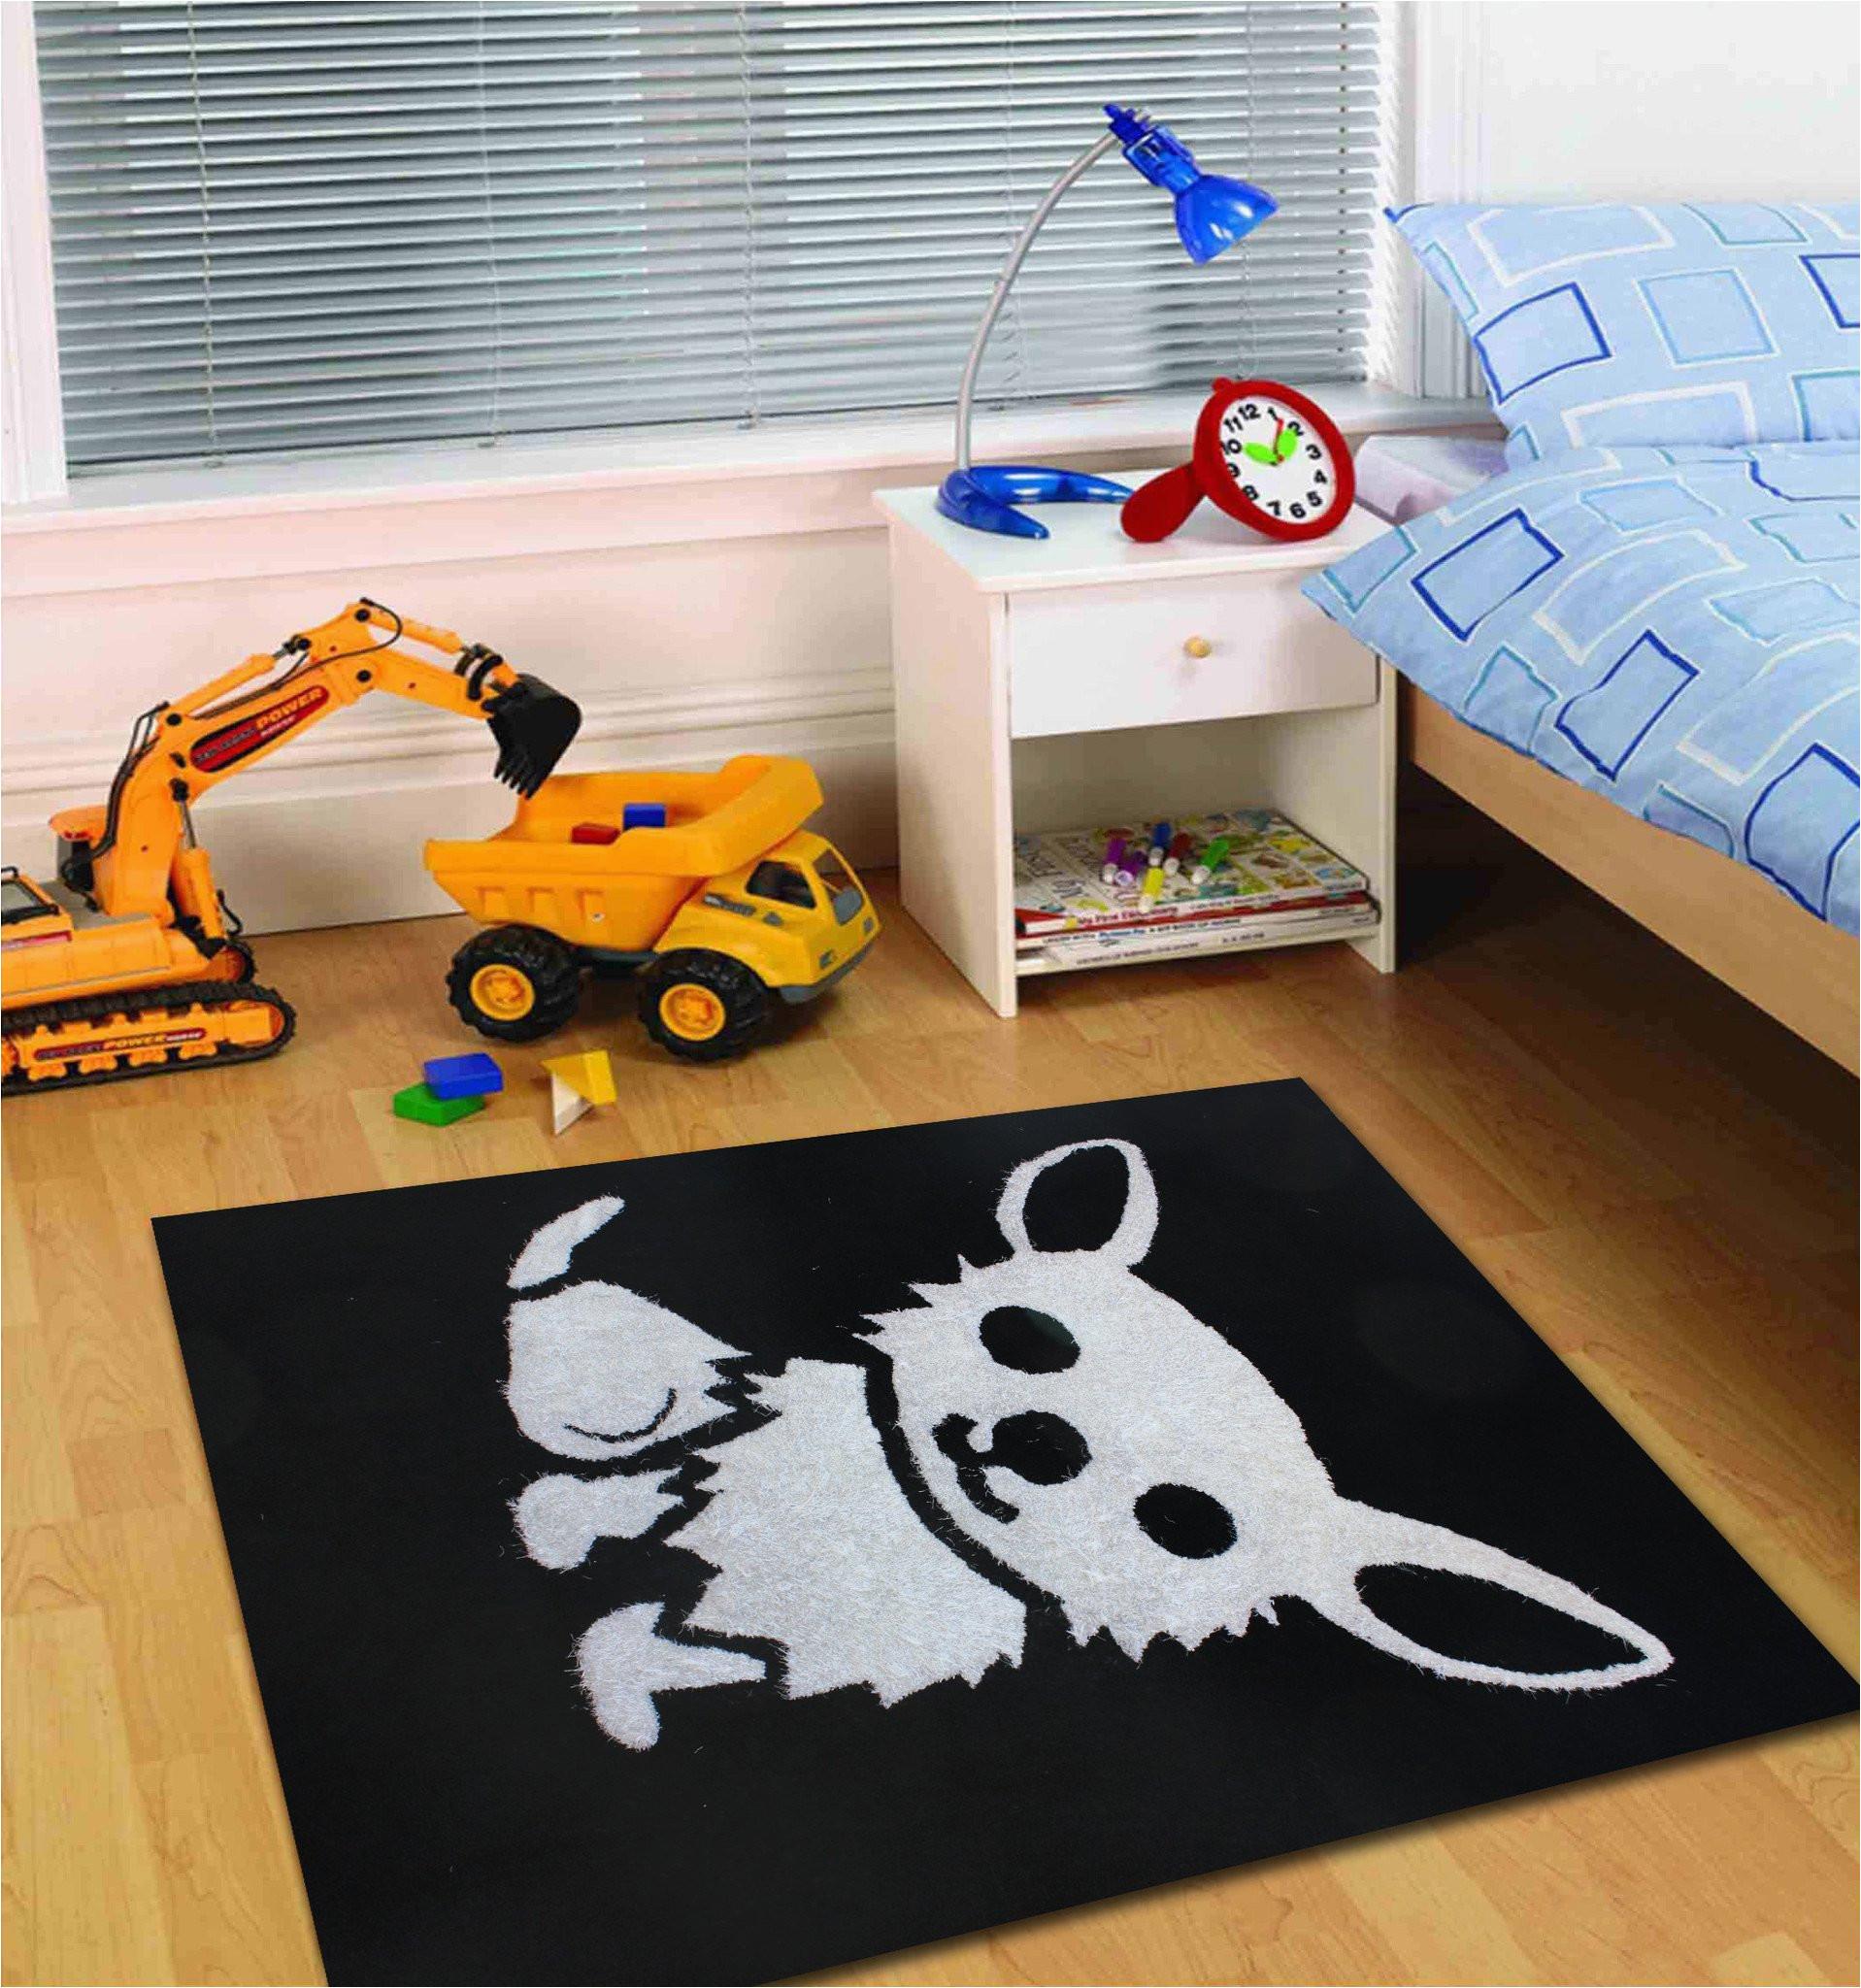 4 x 54 ft all black kids bedroom area rug with white dog design